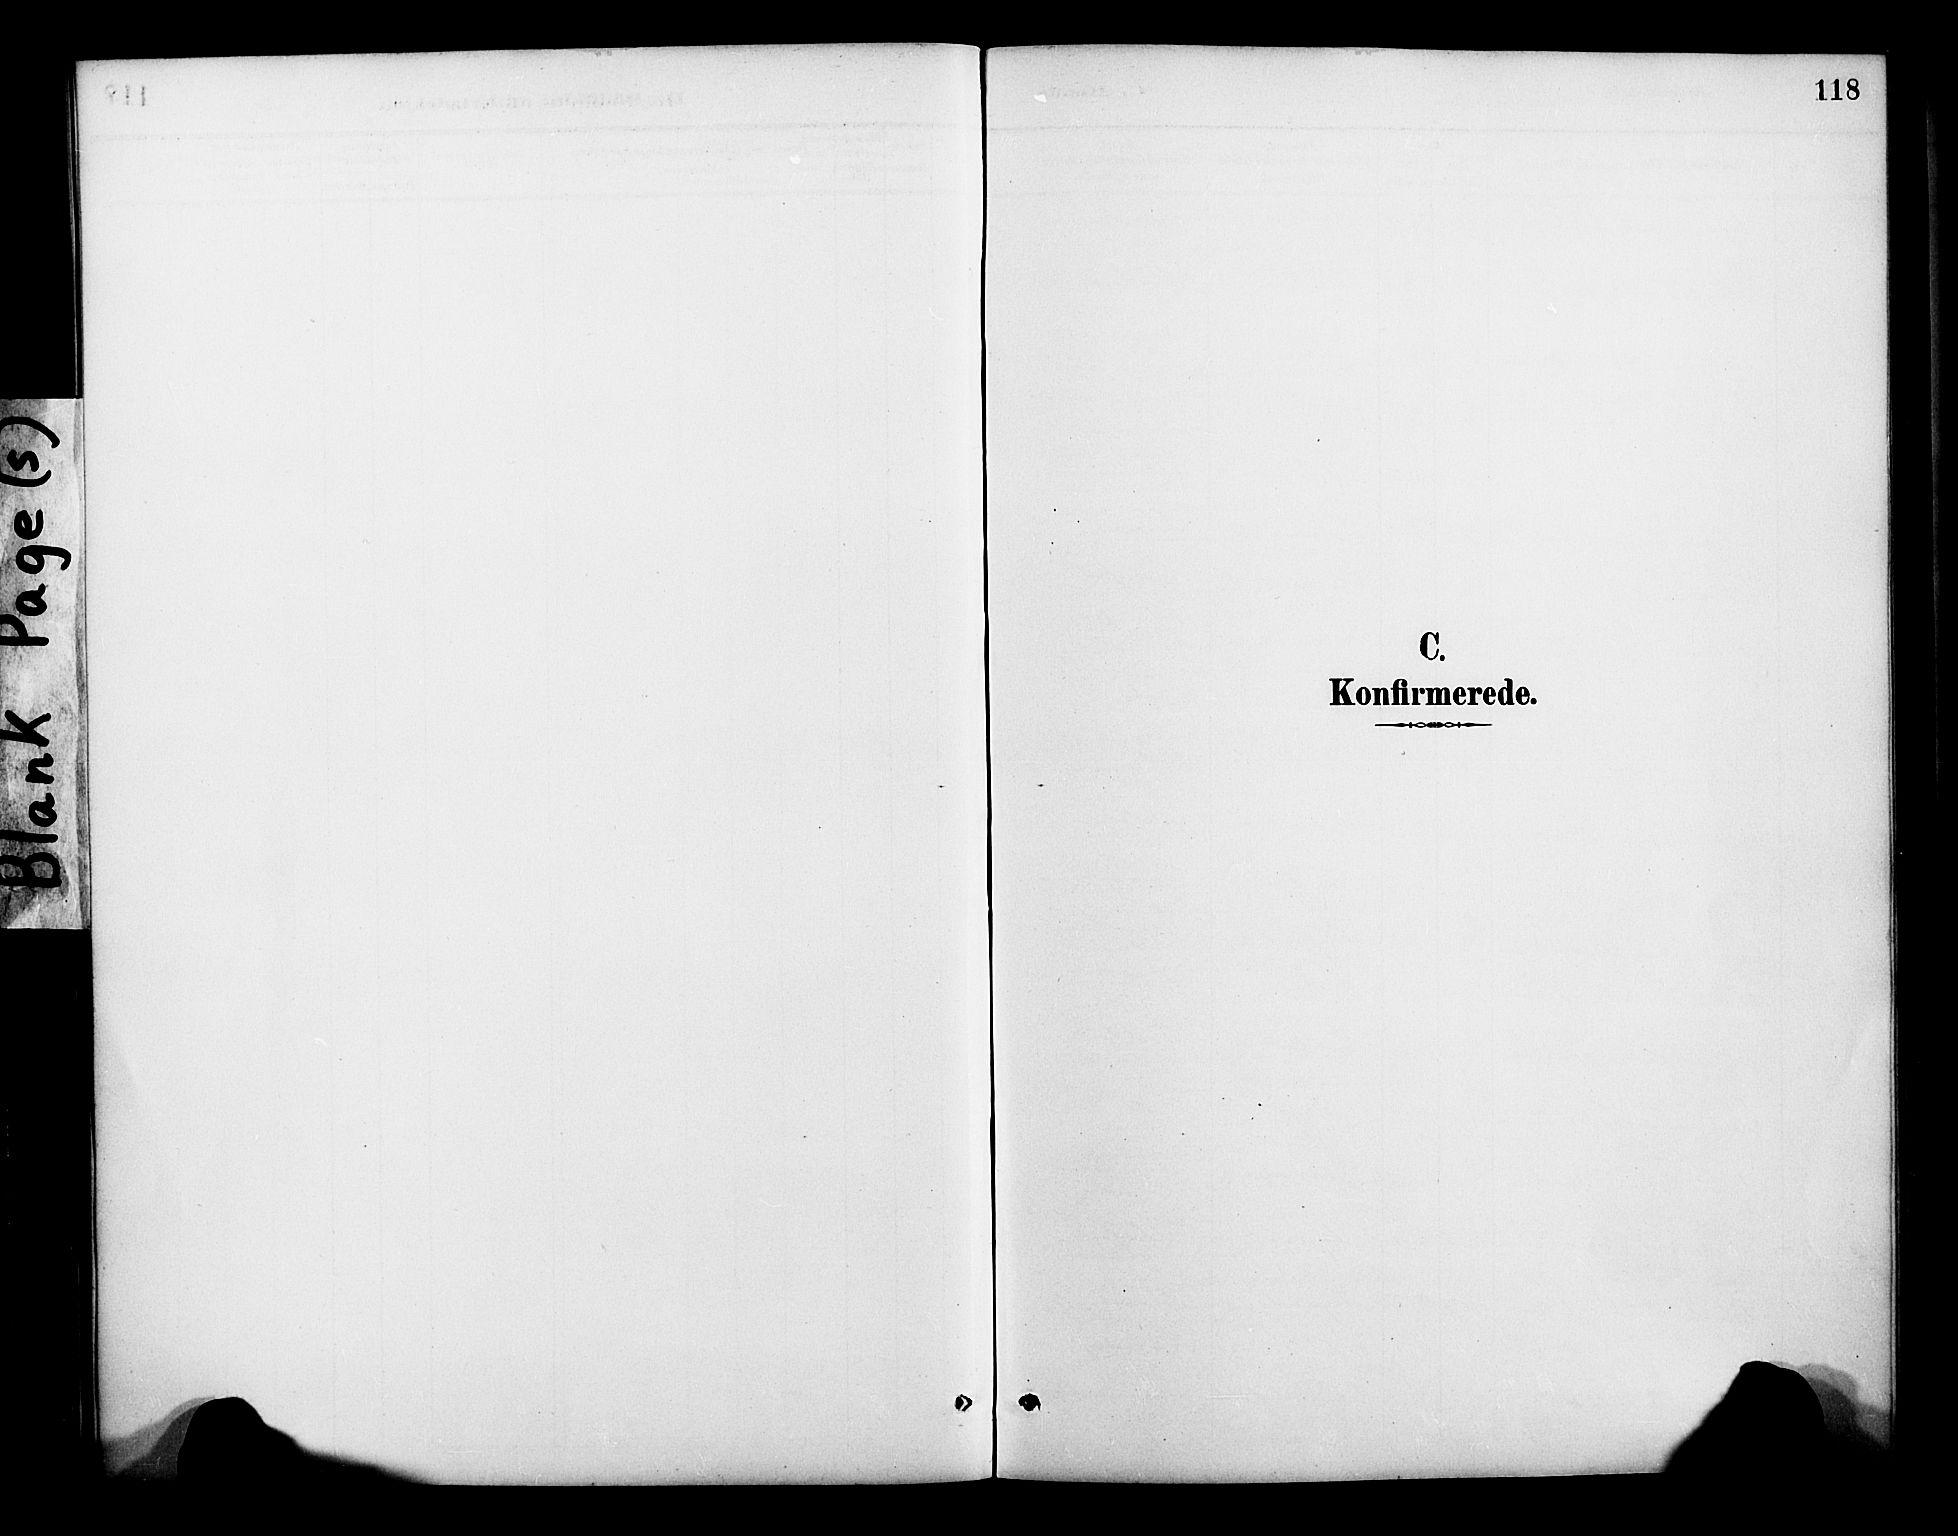 SATØ, Lenvik sokneprestembete, H/Ha: Parish register (official) no. 13, 1890-1898, p. 118